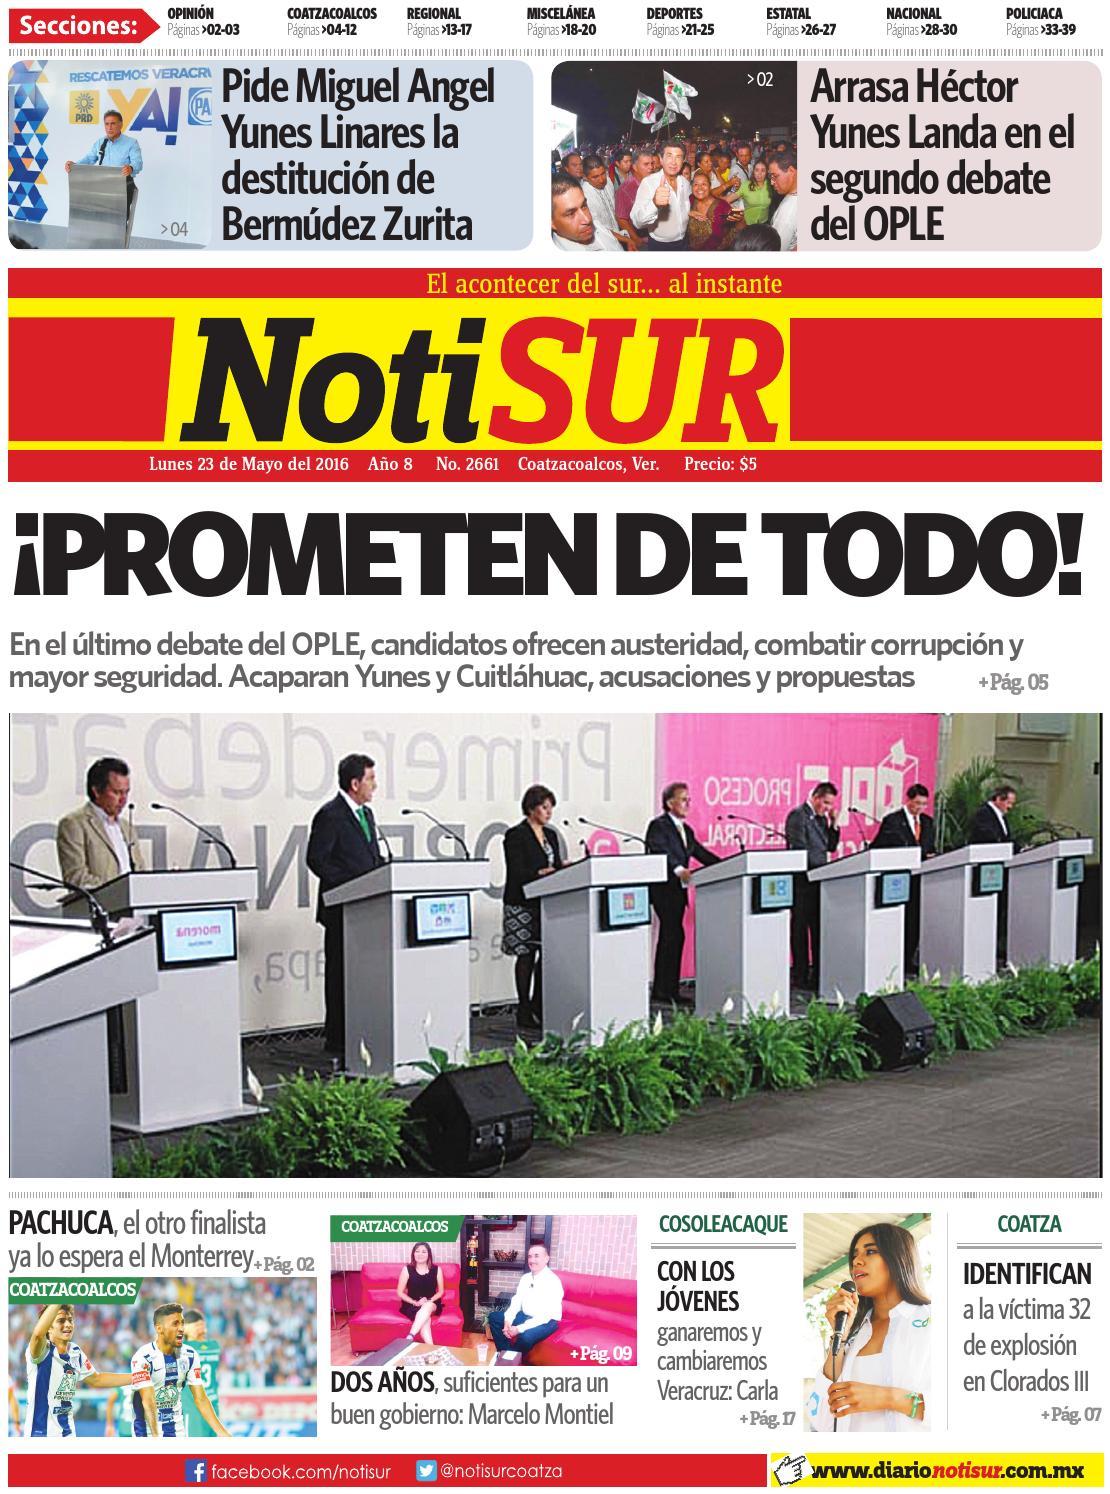 e31f11d139f6c NotiSUR 23 de mayo 2016 by Diario NotiSUR Coatzacoalcos 2015